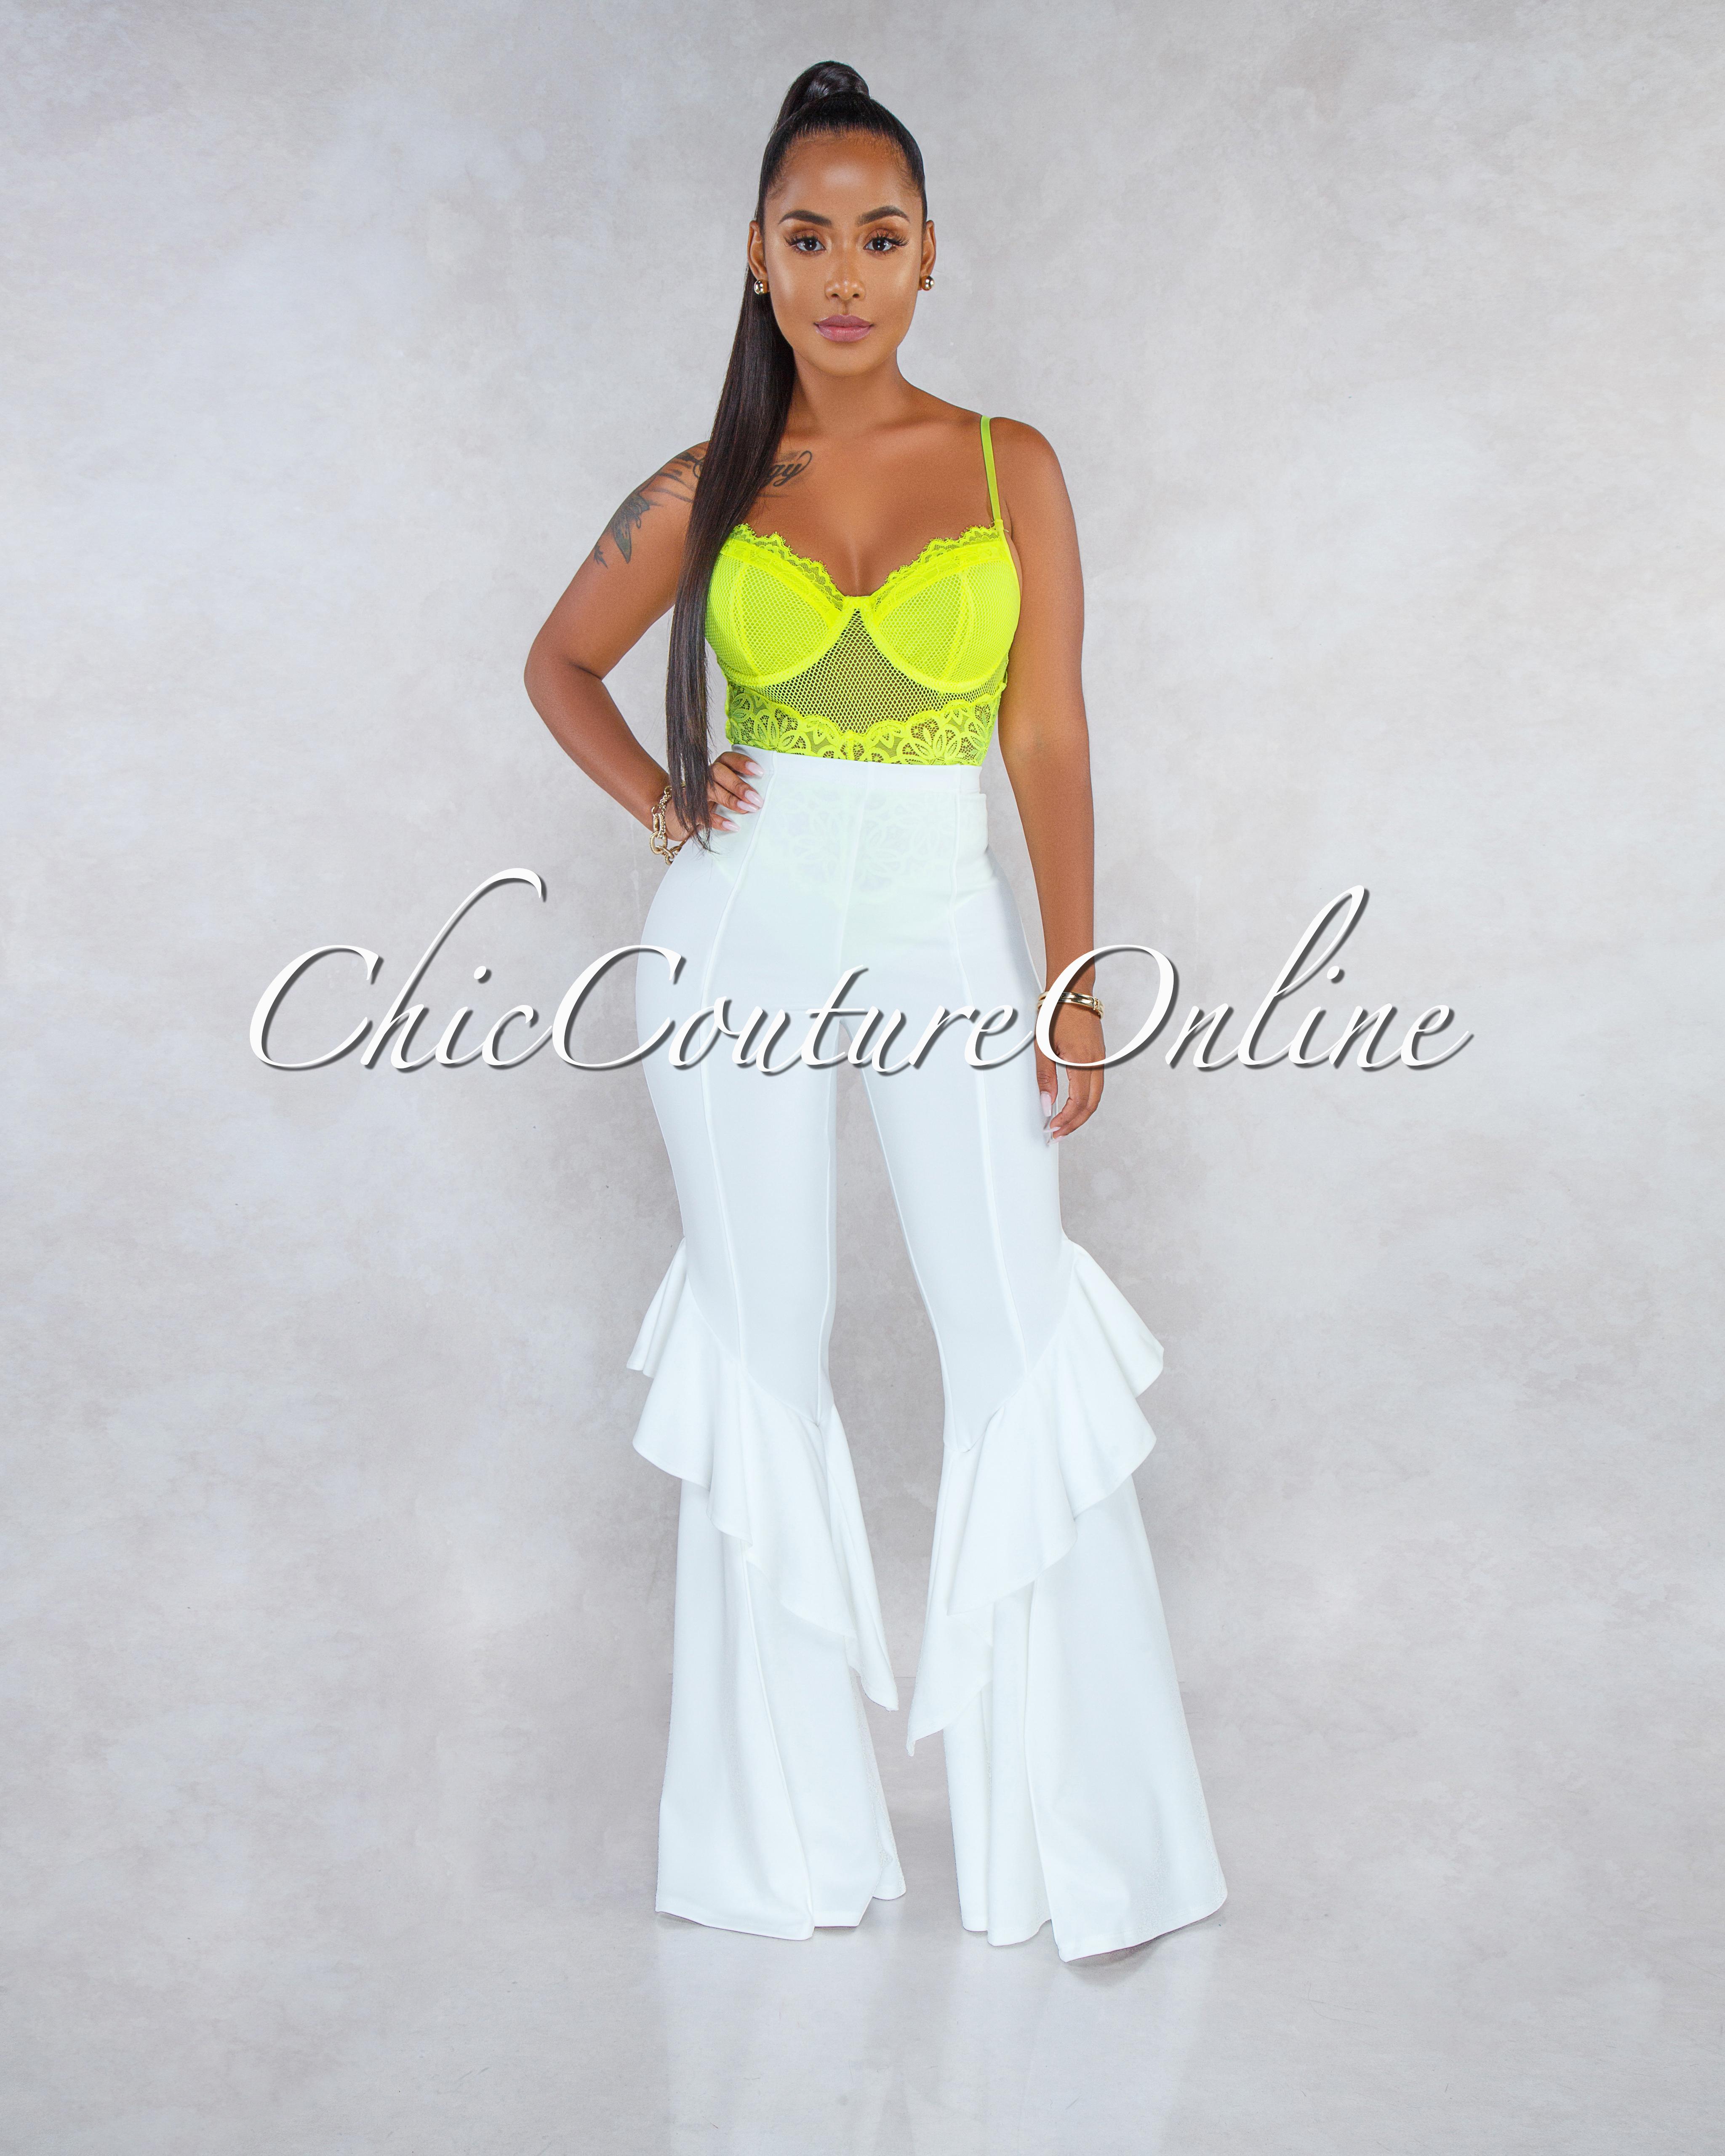 Yulissa Neon Lime Floral Lace Mesh Top Bodysuit